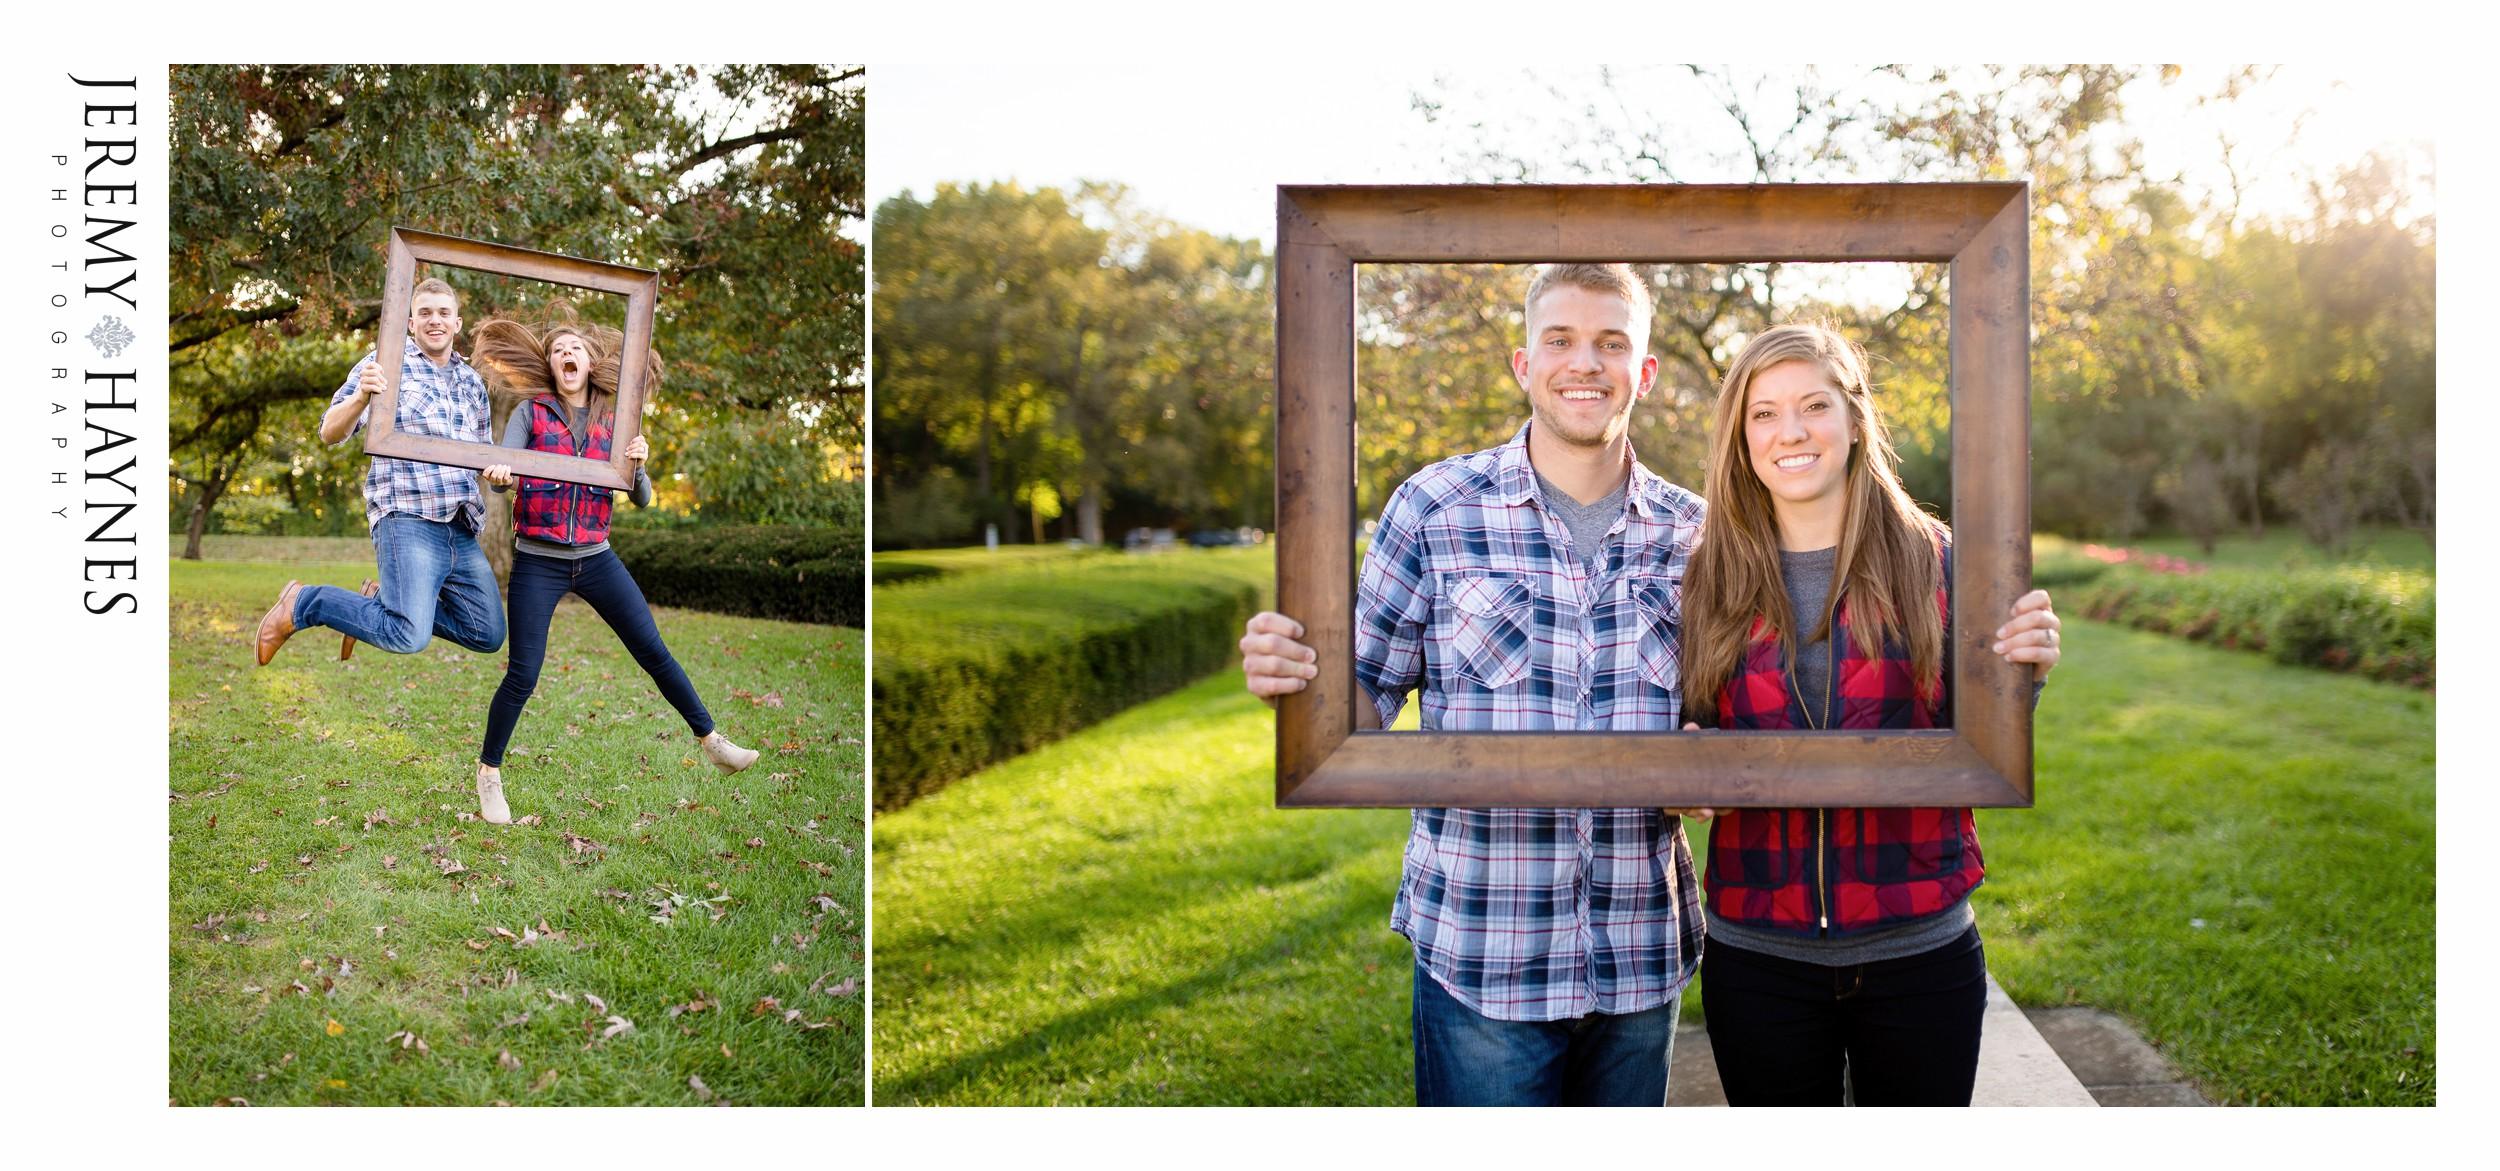 fun-photo-frame-idea-engagement.jpg